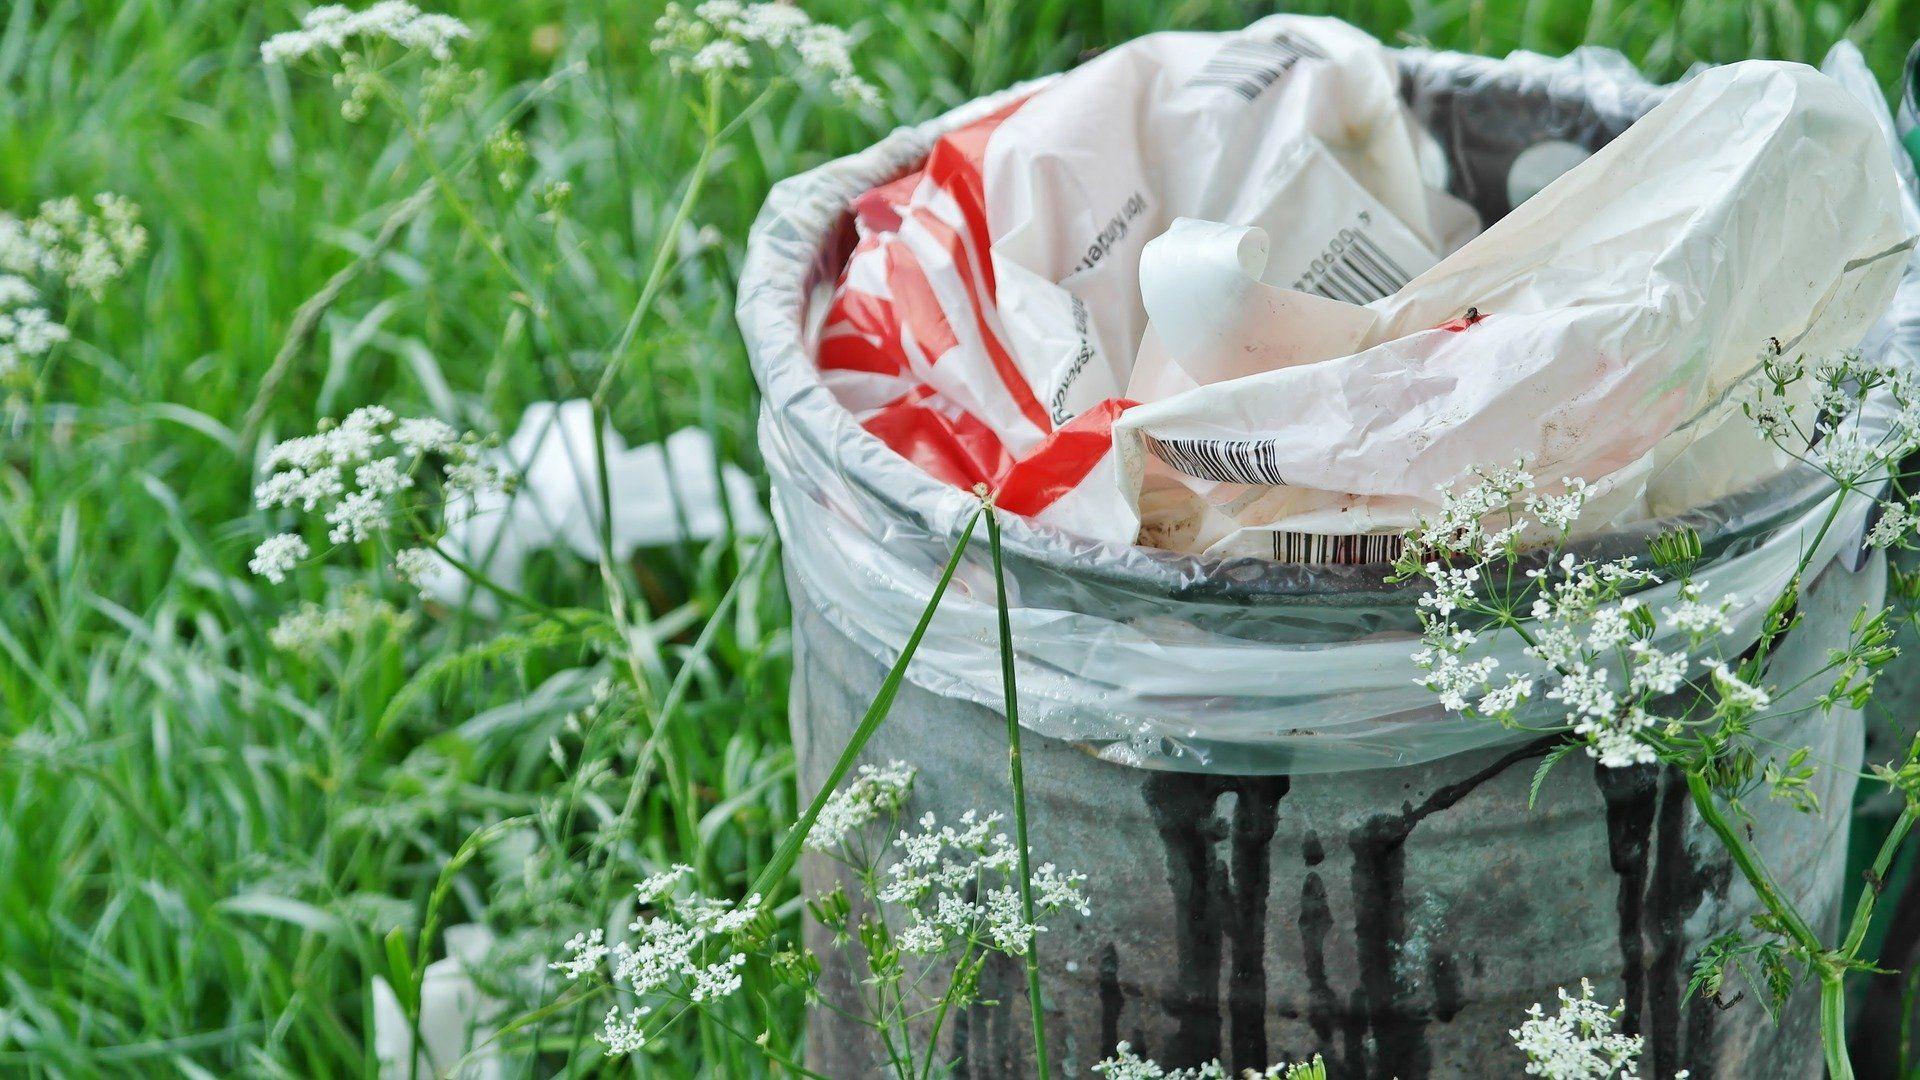 Come ridurre i rifiuti in cucina